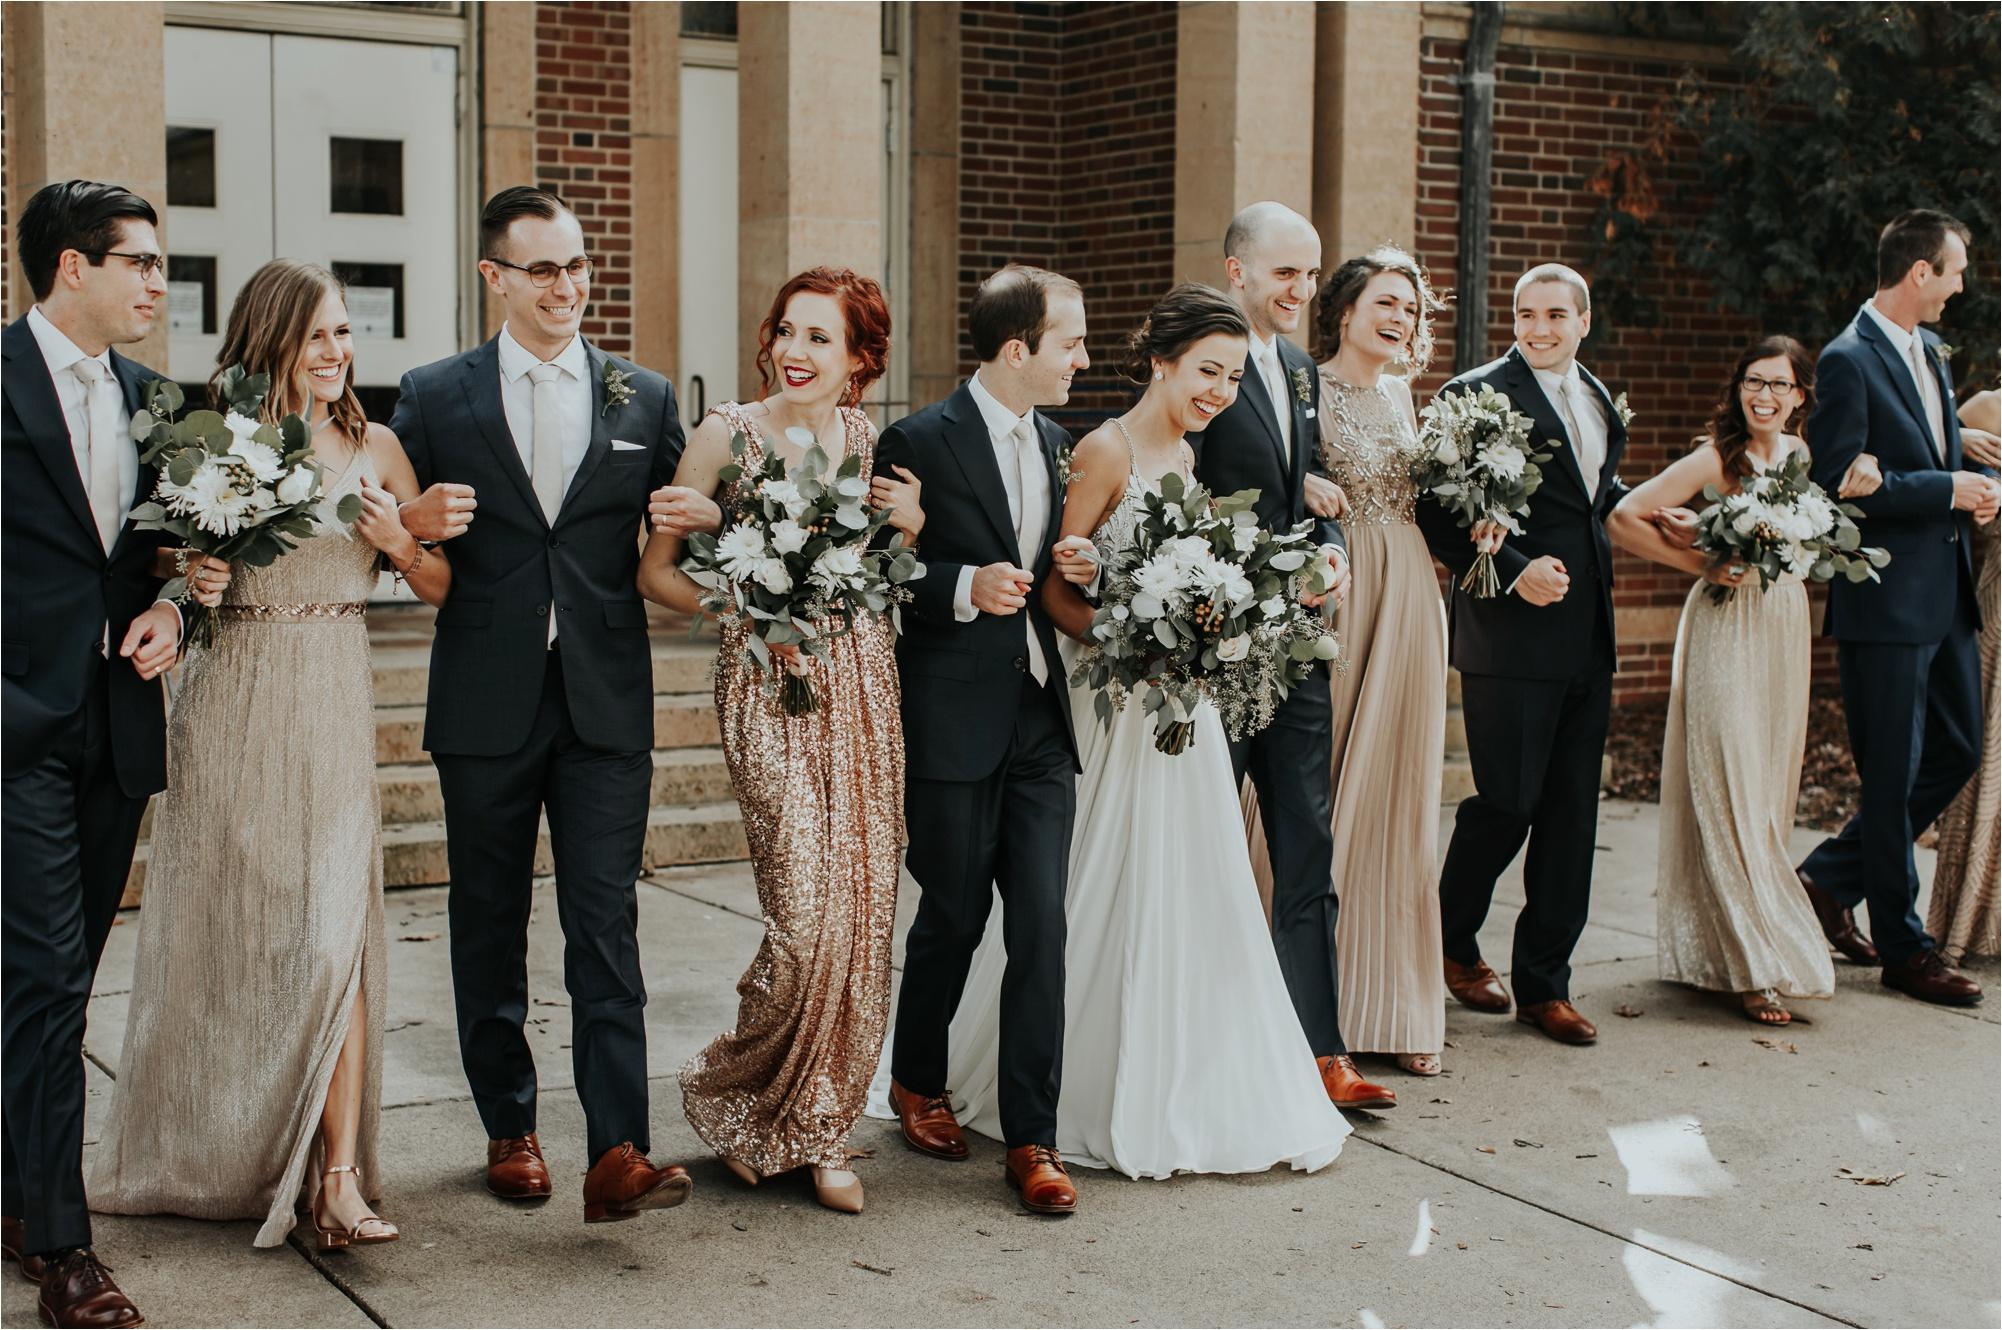 Five Event Center Uptown Minneapolis Wedding Photographer_2556.jpg